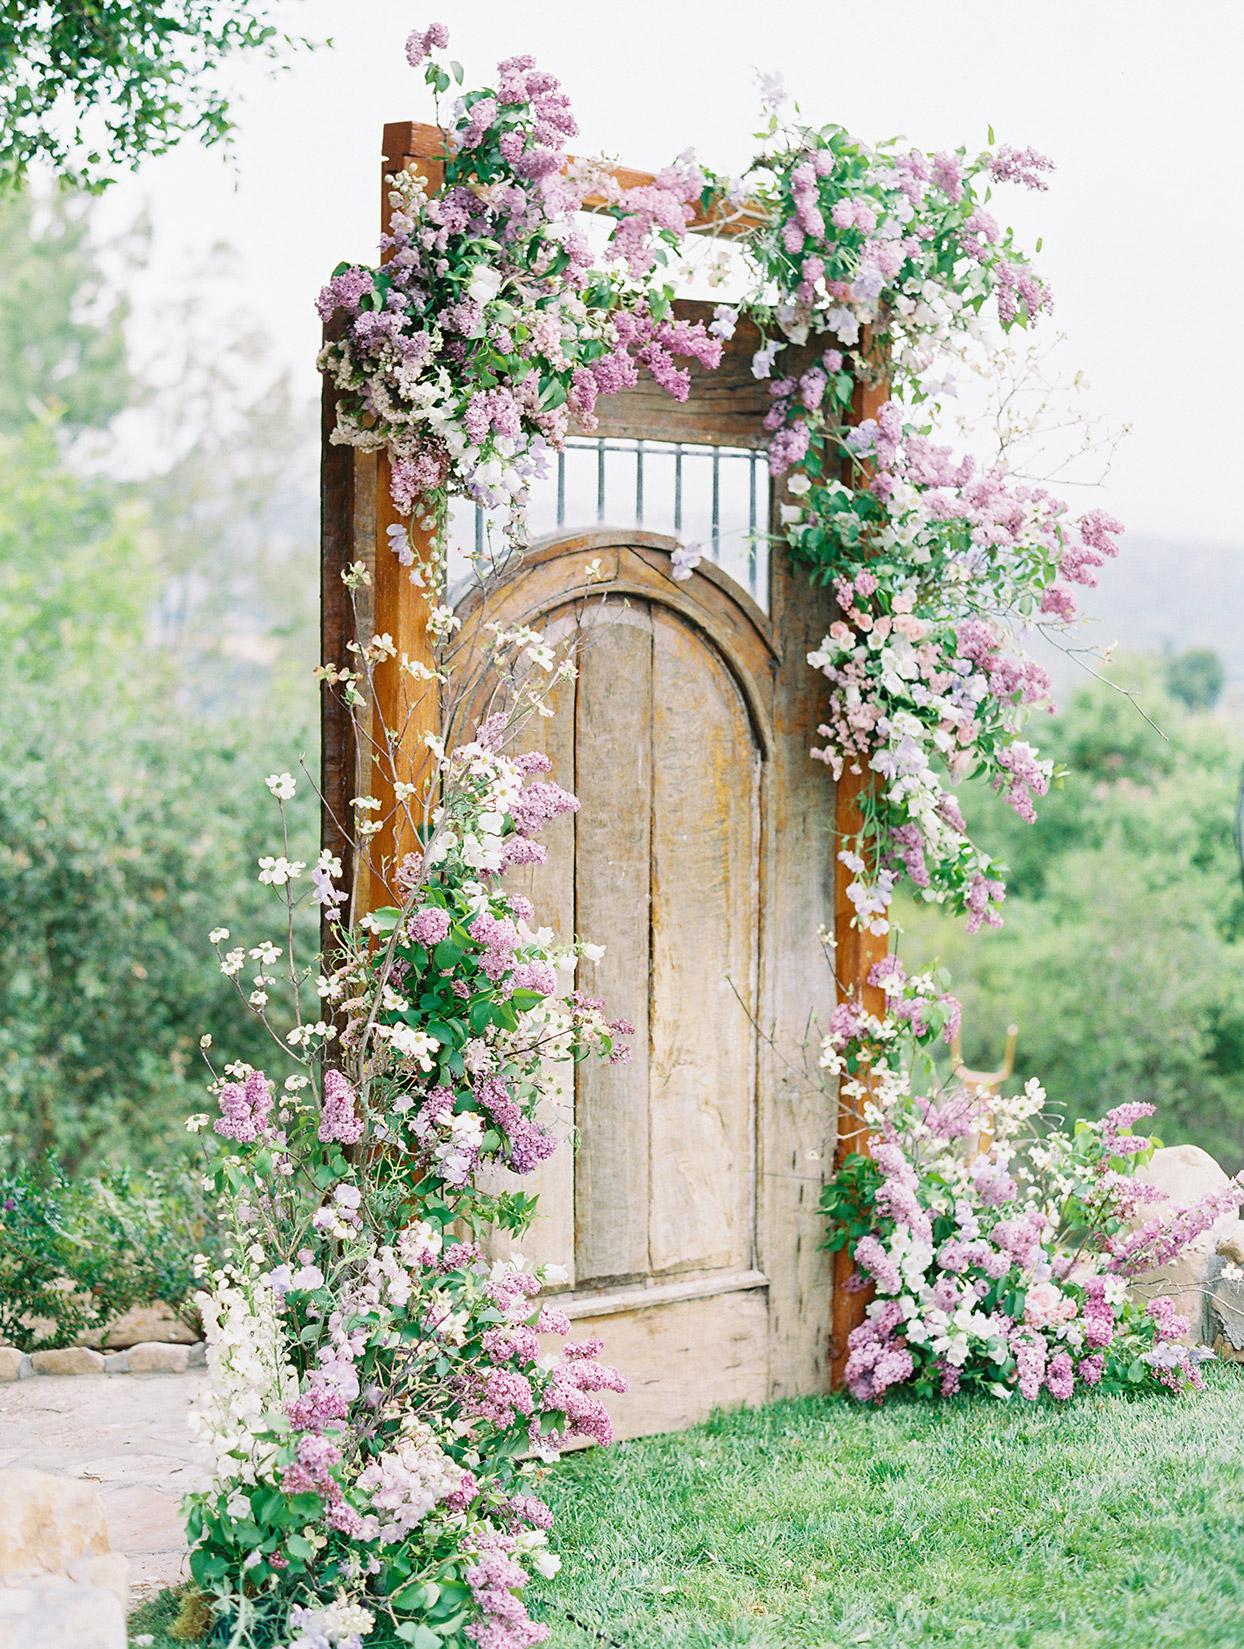 raina salih wedding ceremony door with flowers